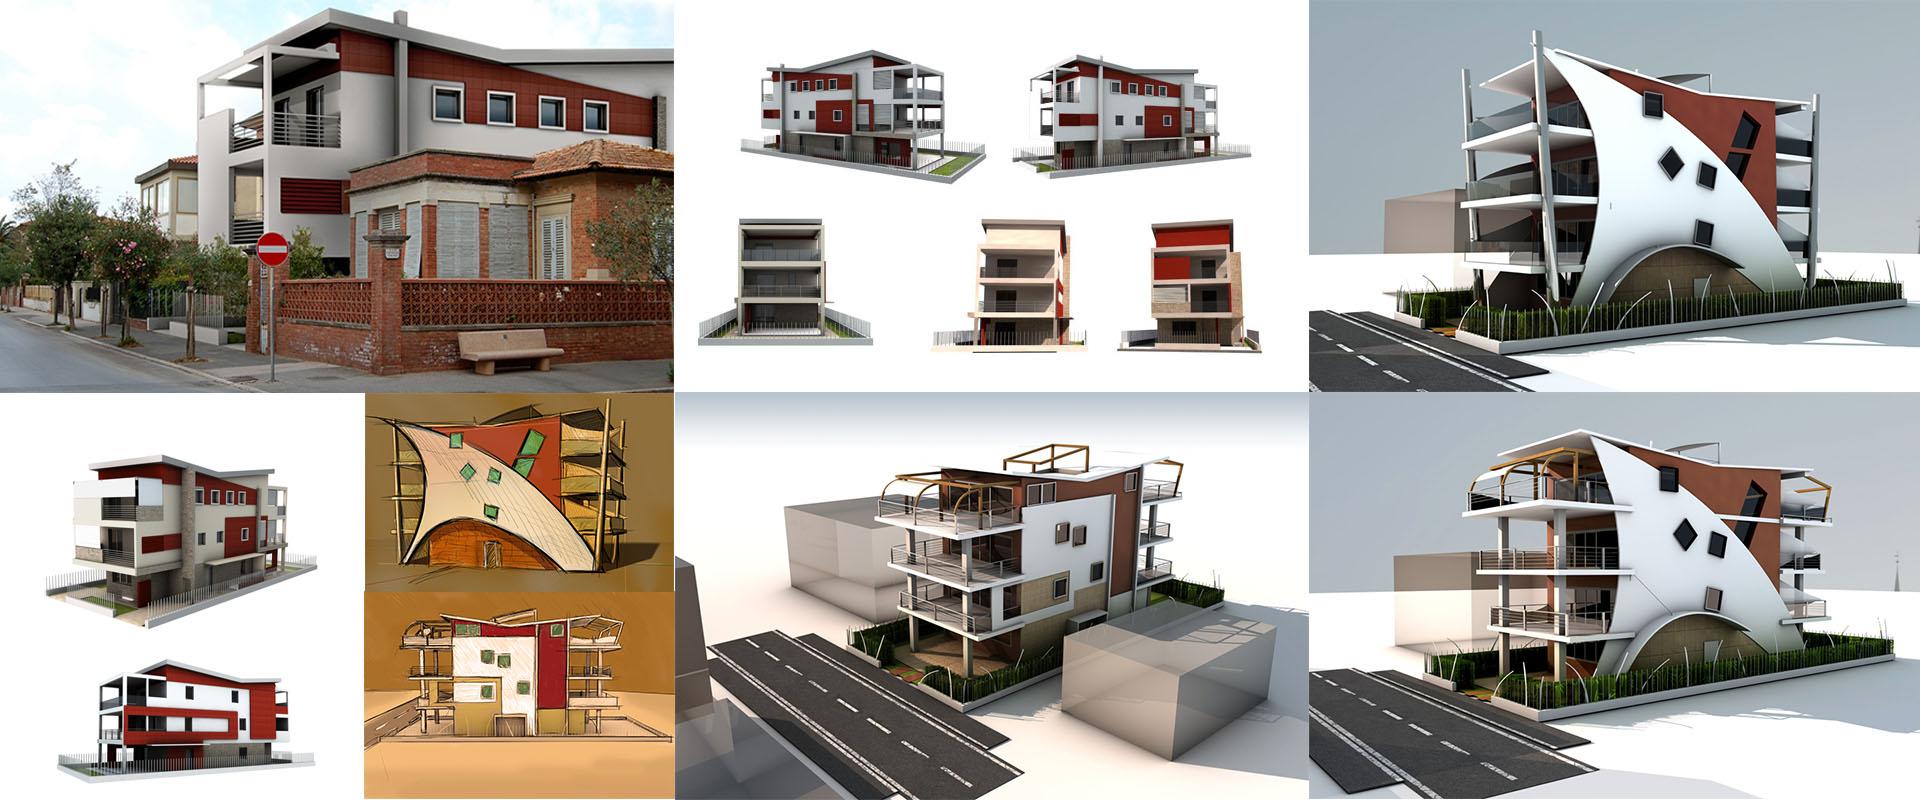 aironic_architettura_design_interior_marina